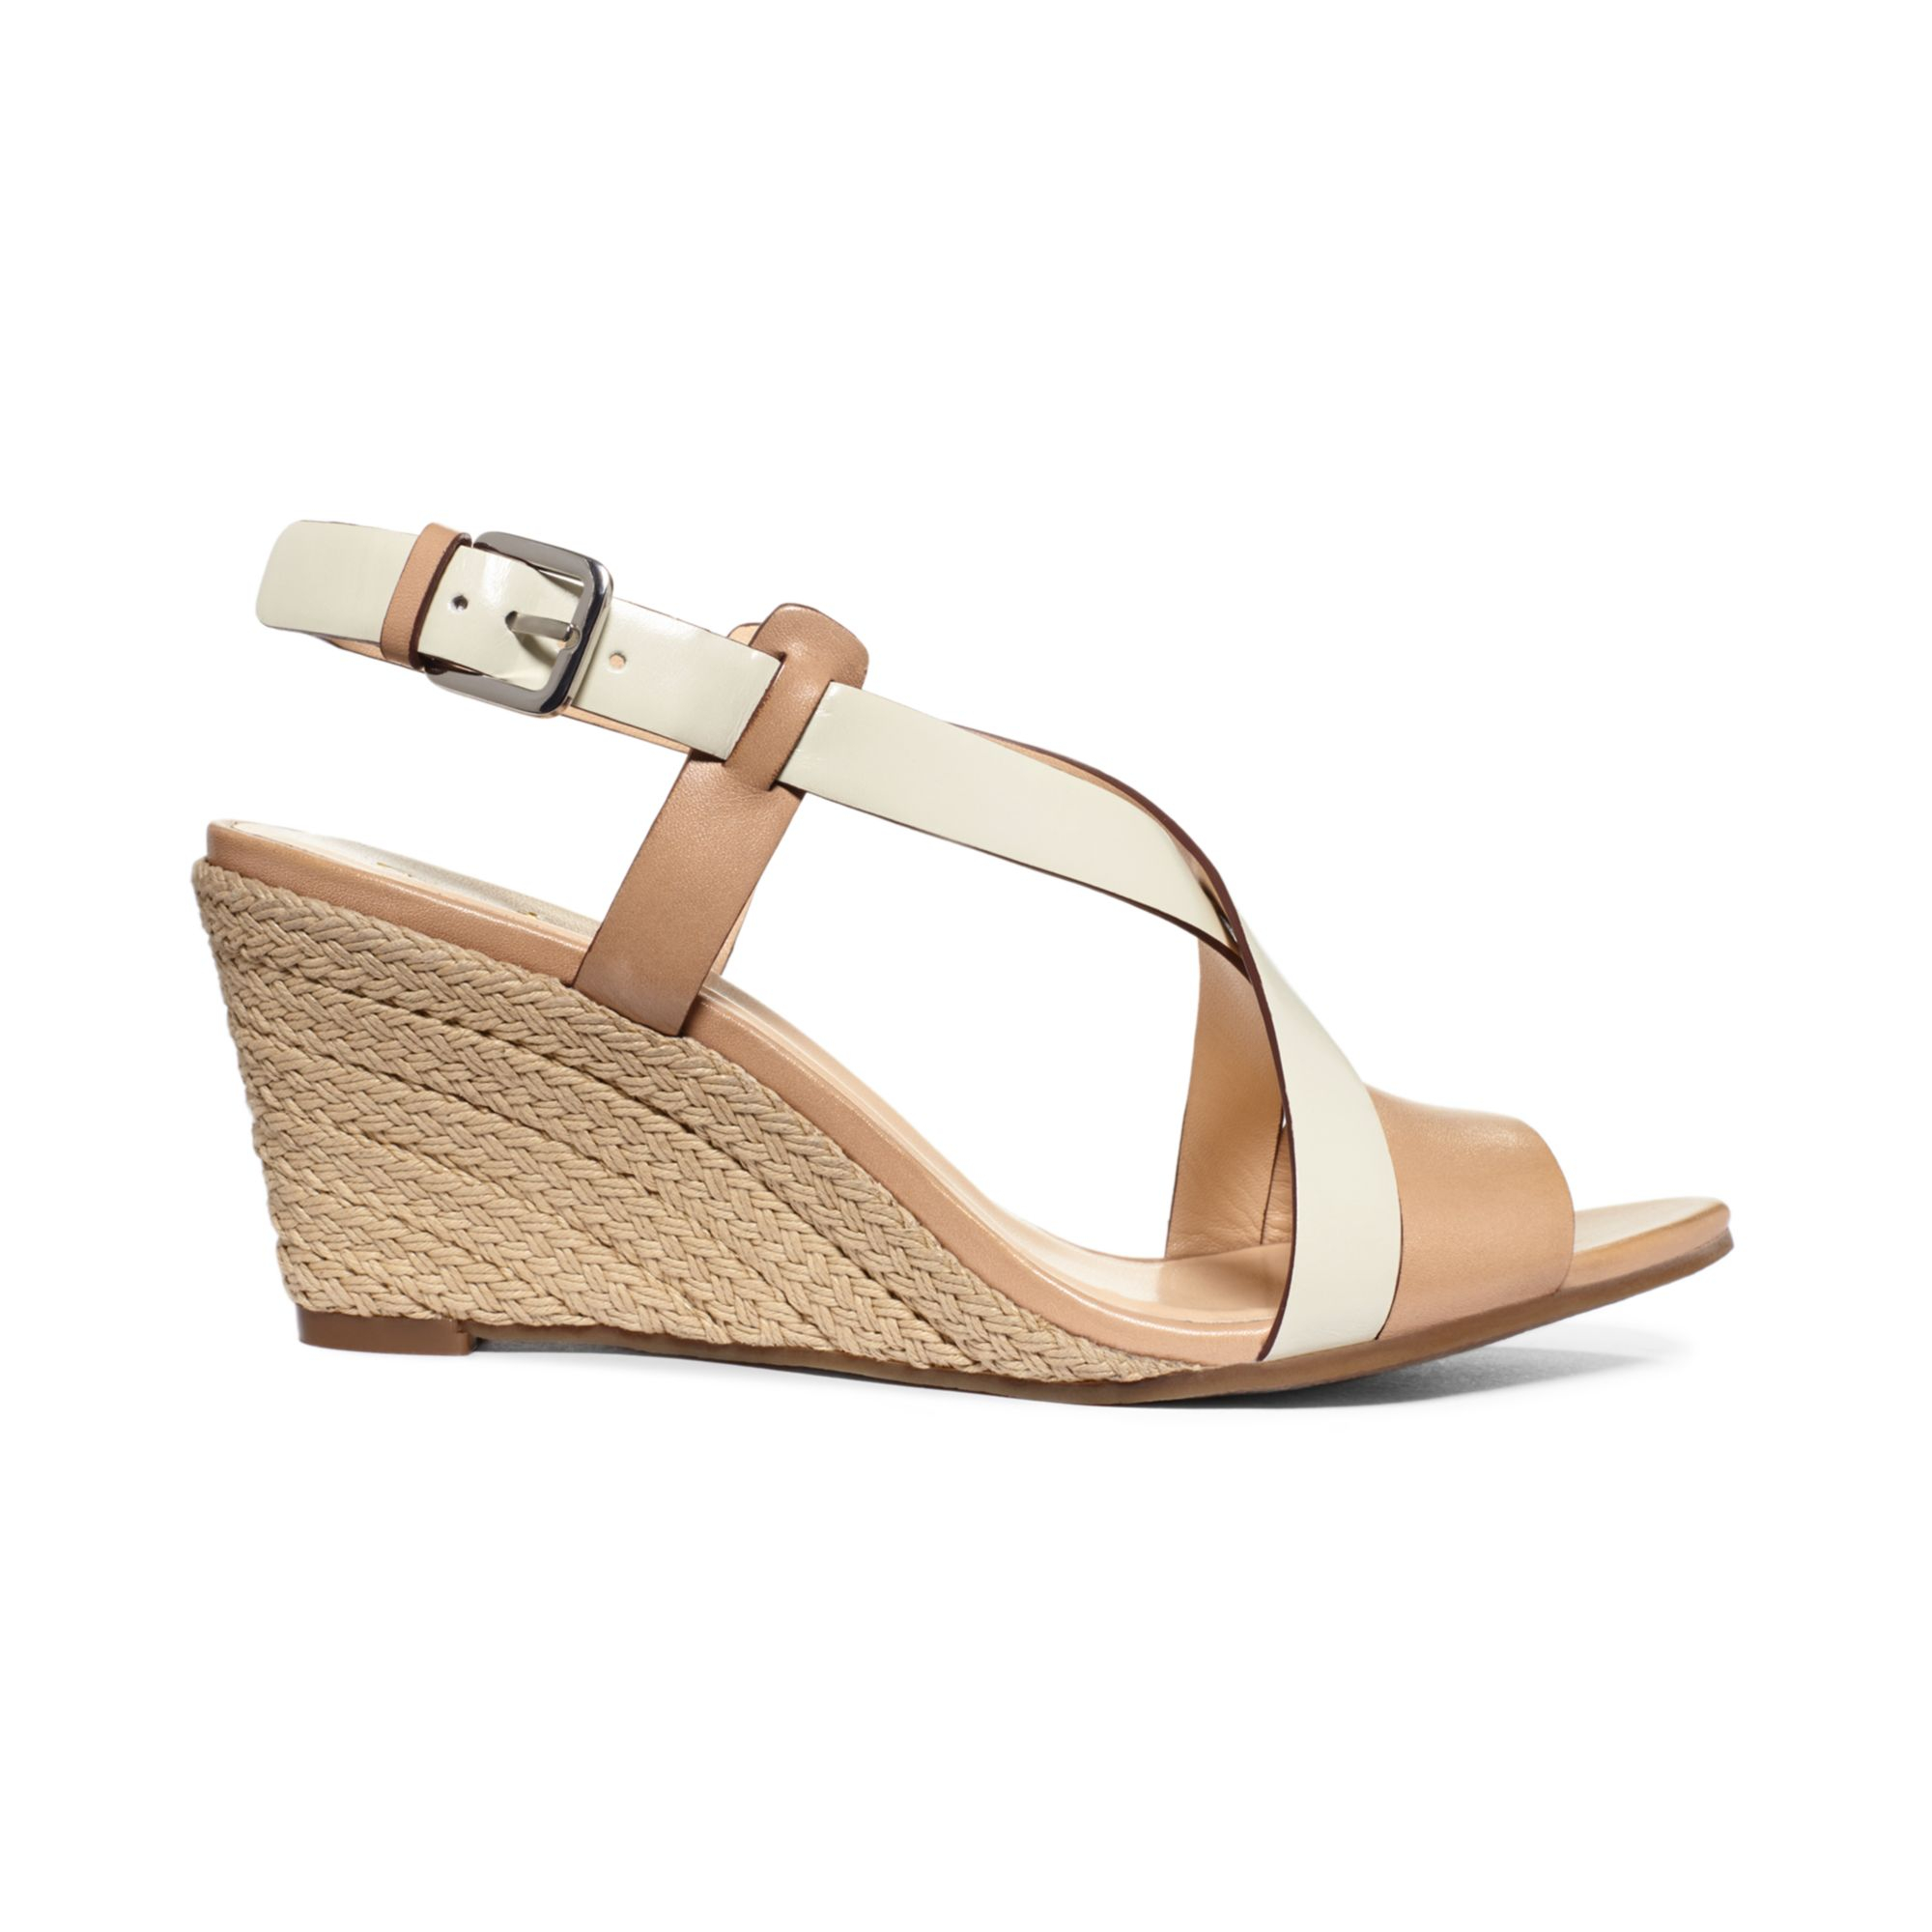 Fantastic   Shop Shoes Sandals Cole Haan Sandals Women S Cole Haan Air Kennedy